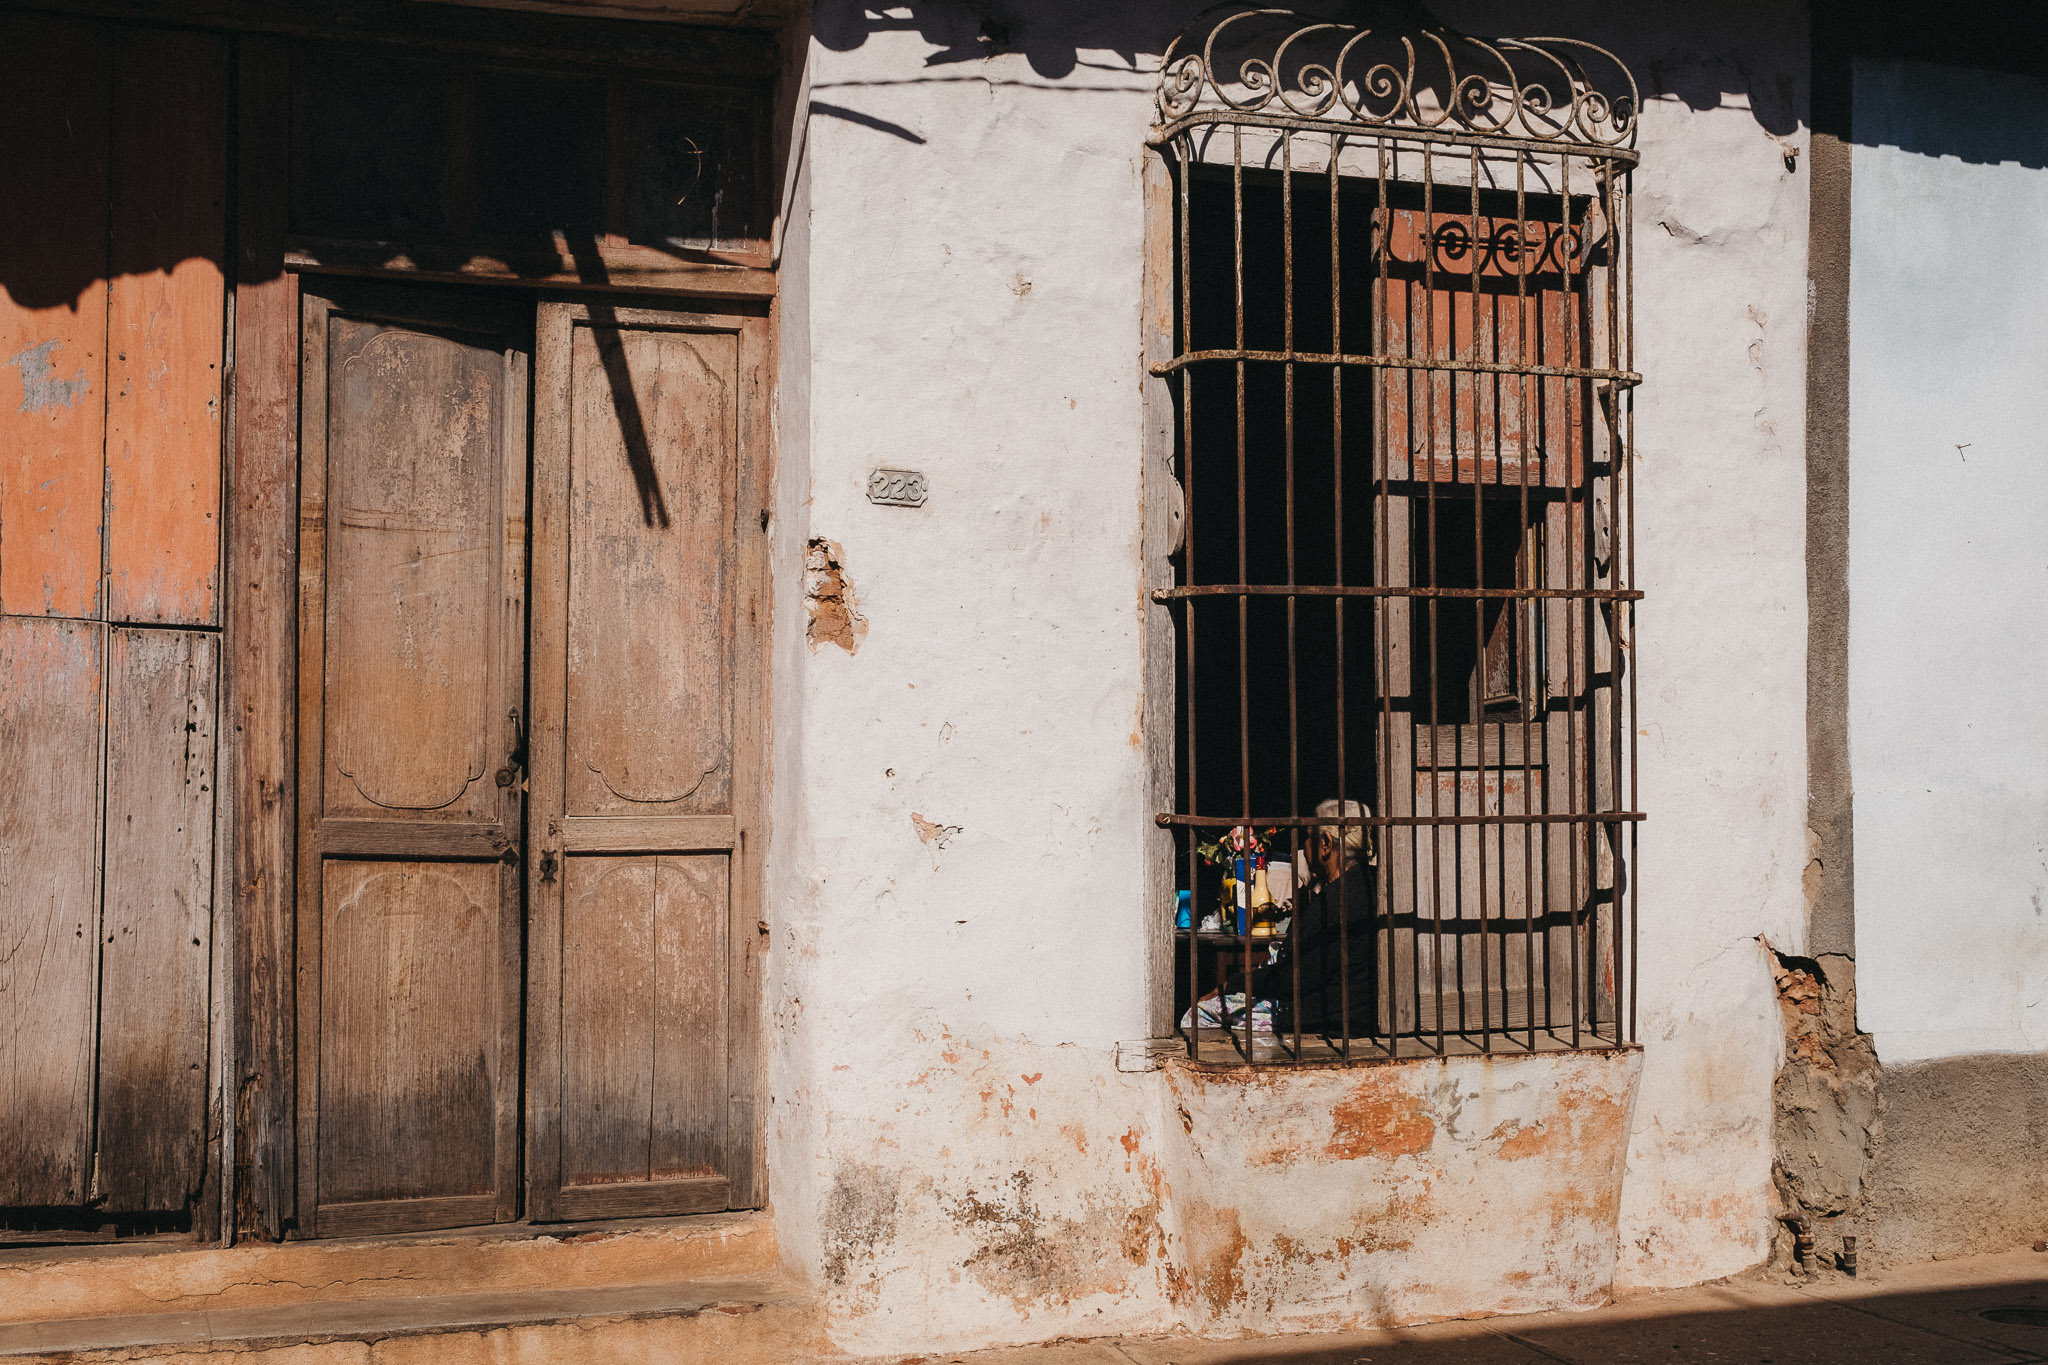 Cuba-2017-12-Trinidad-0018.jpg